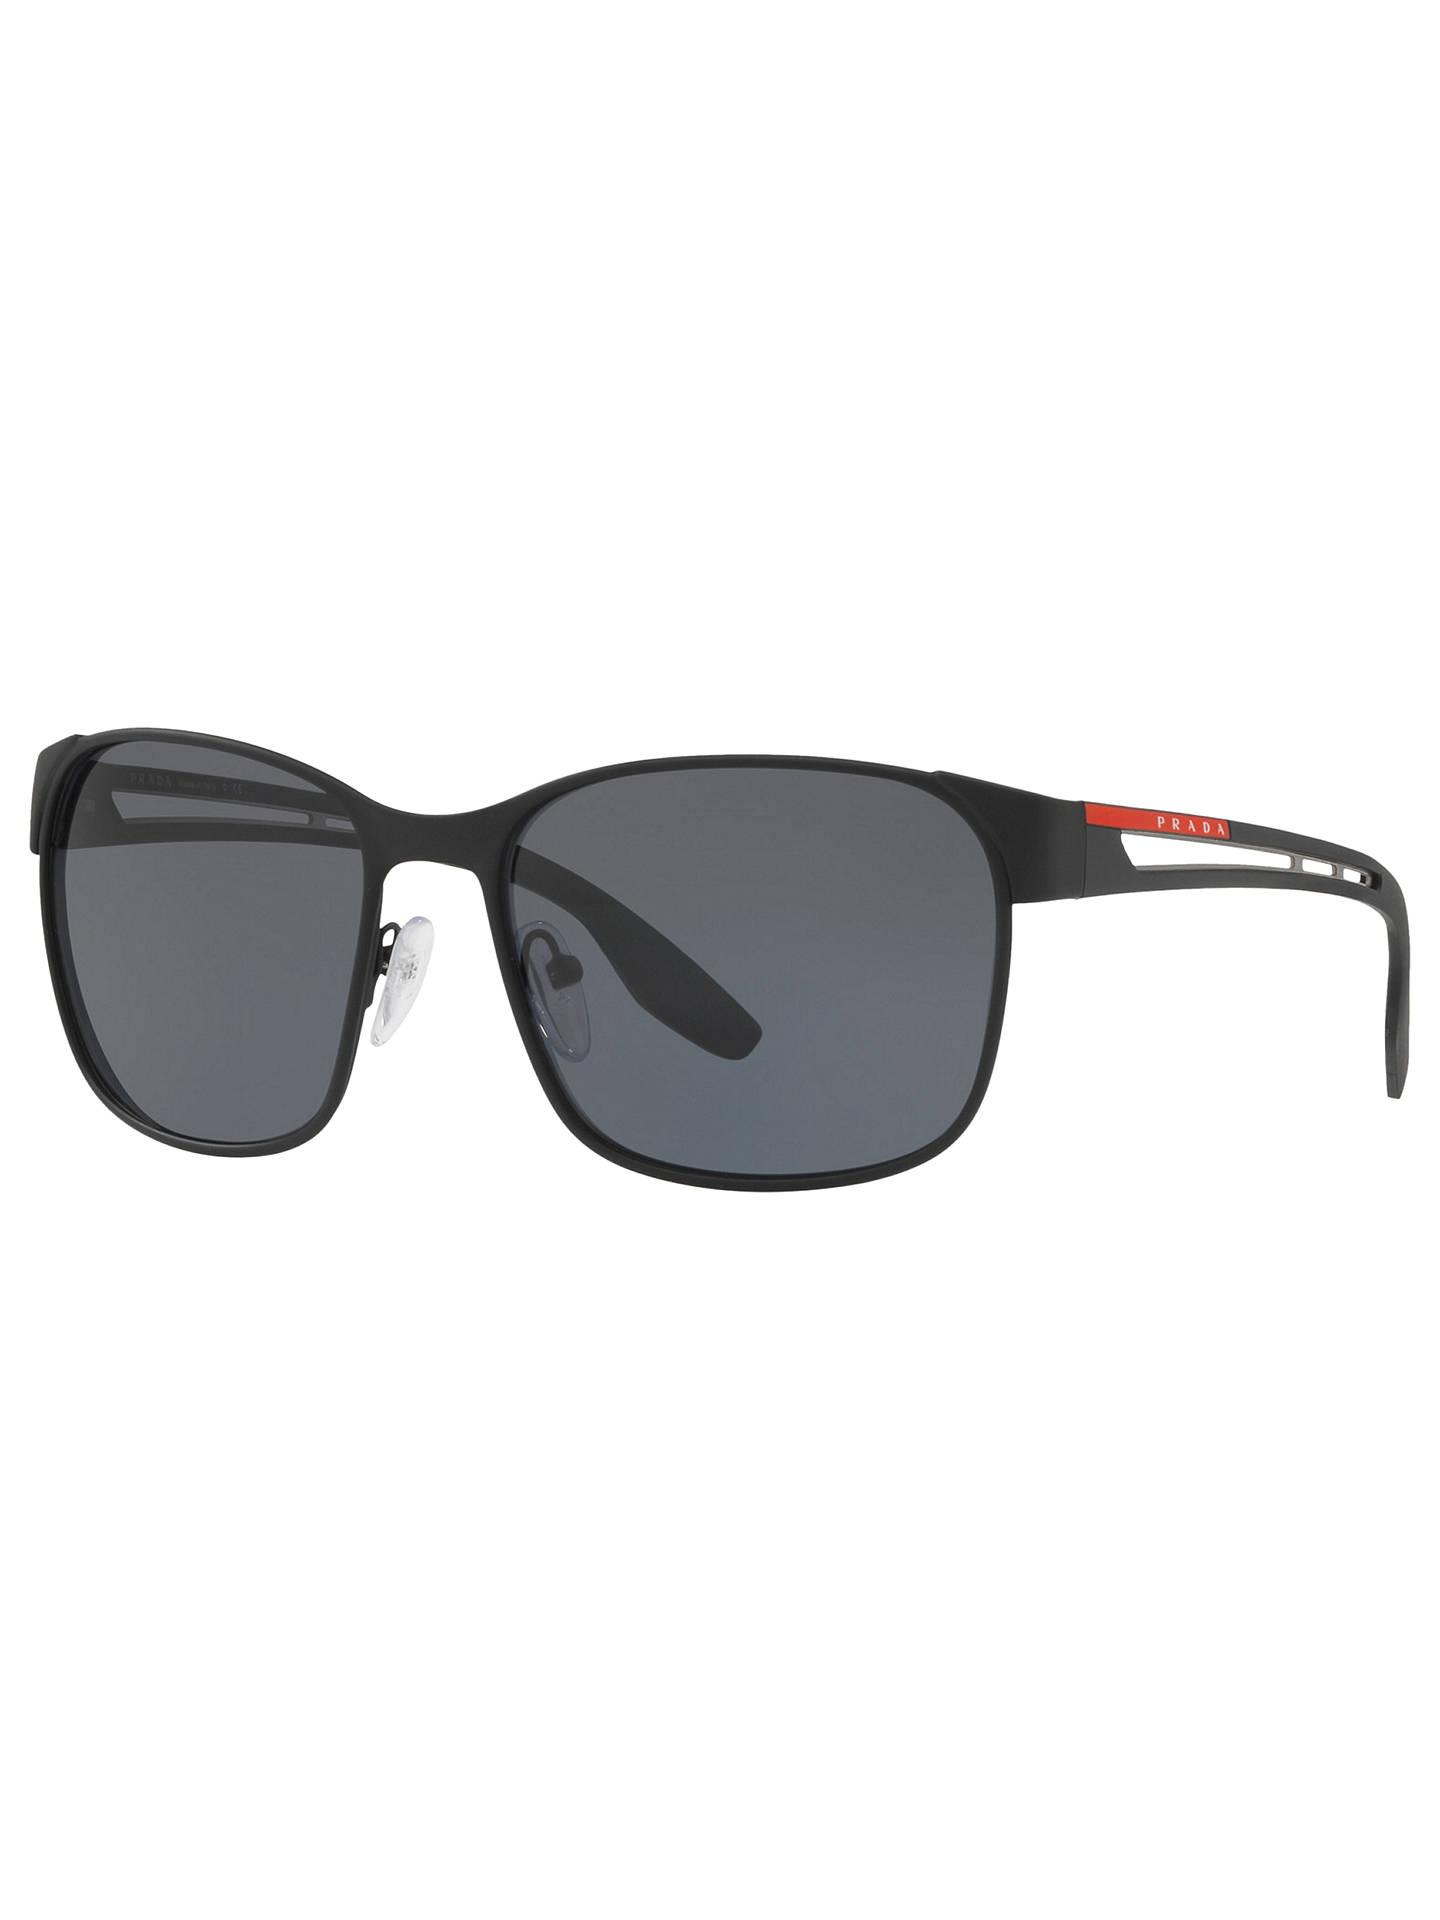 f488fb2eb90d Buy Prada Linea Rossa PS 52TS Men s Square Sunglasses